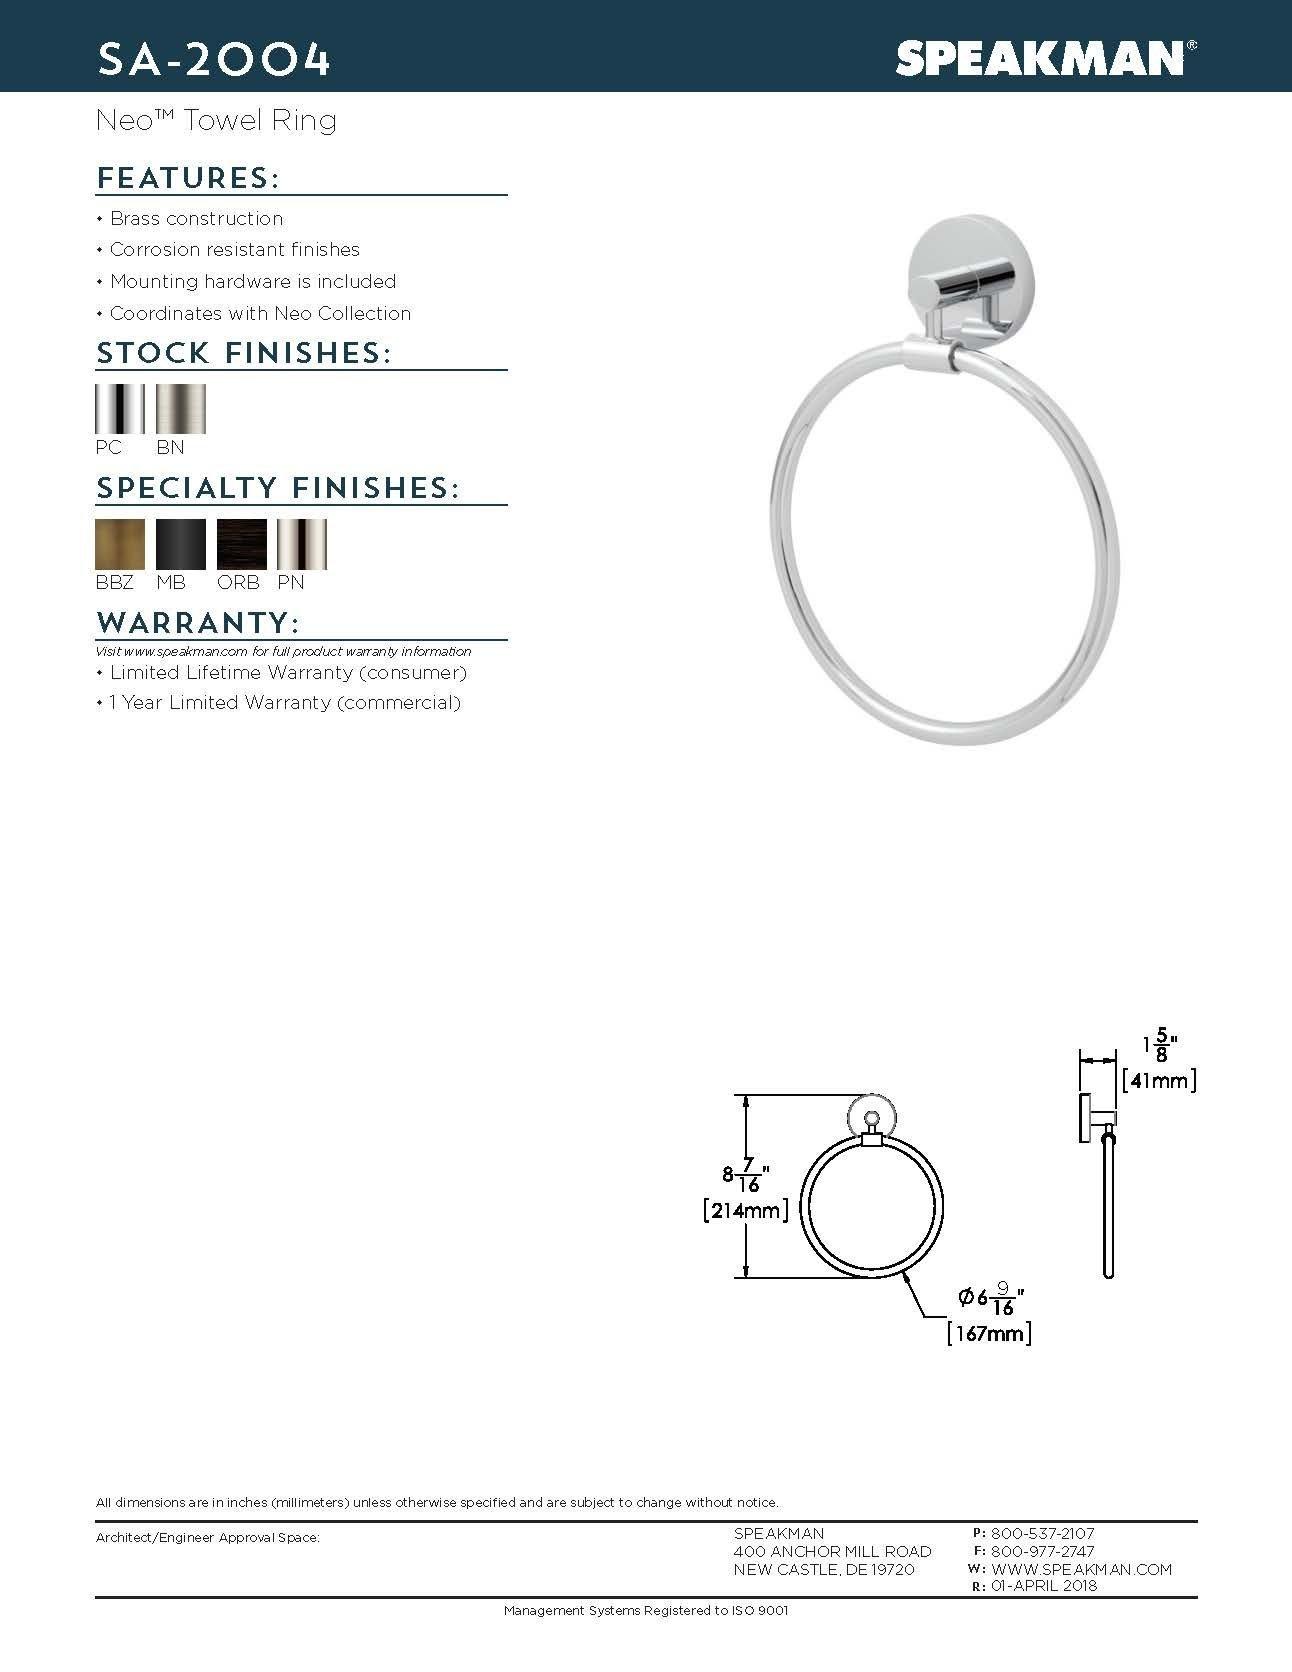 Speakman SA-2004-MB Neo Towel Ring, Matte Black by Speakman (Image #5)